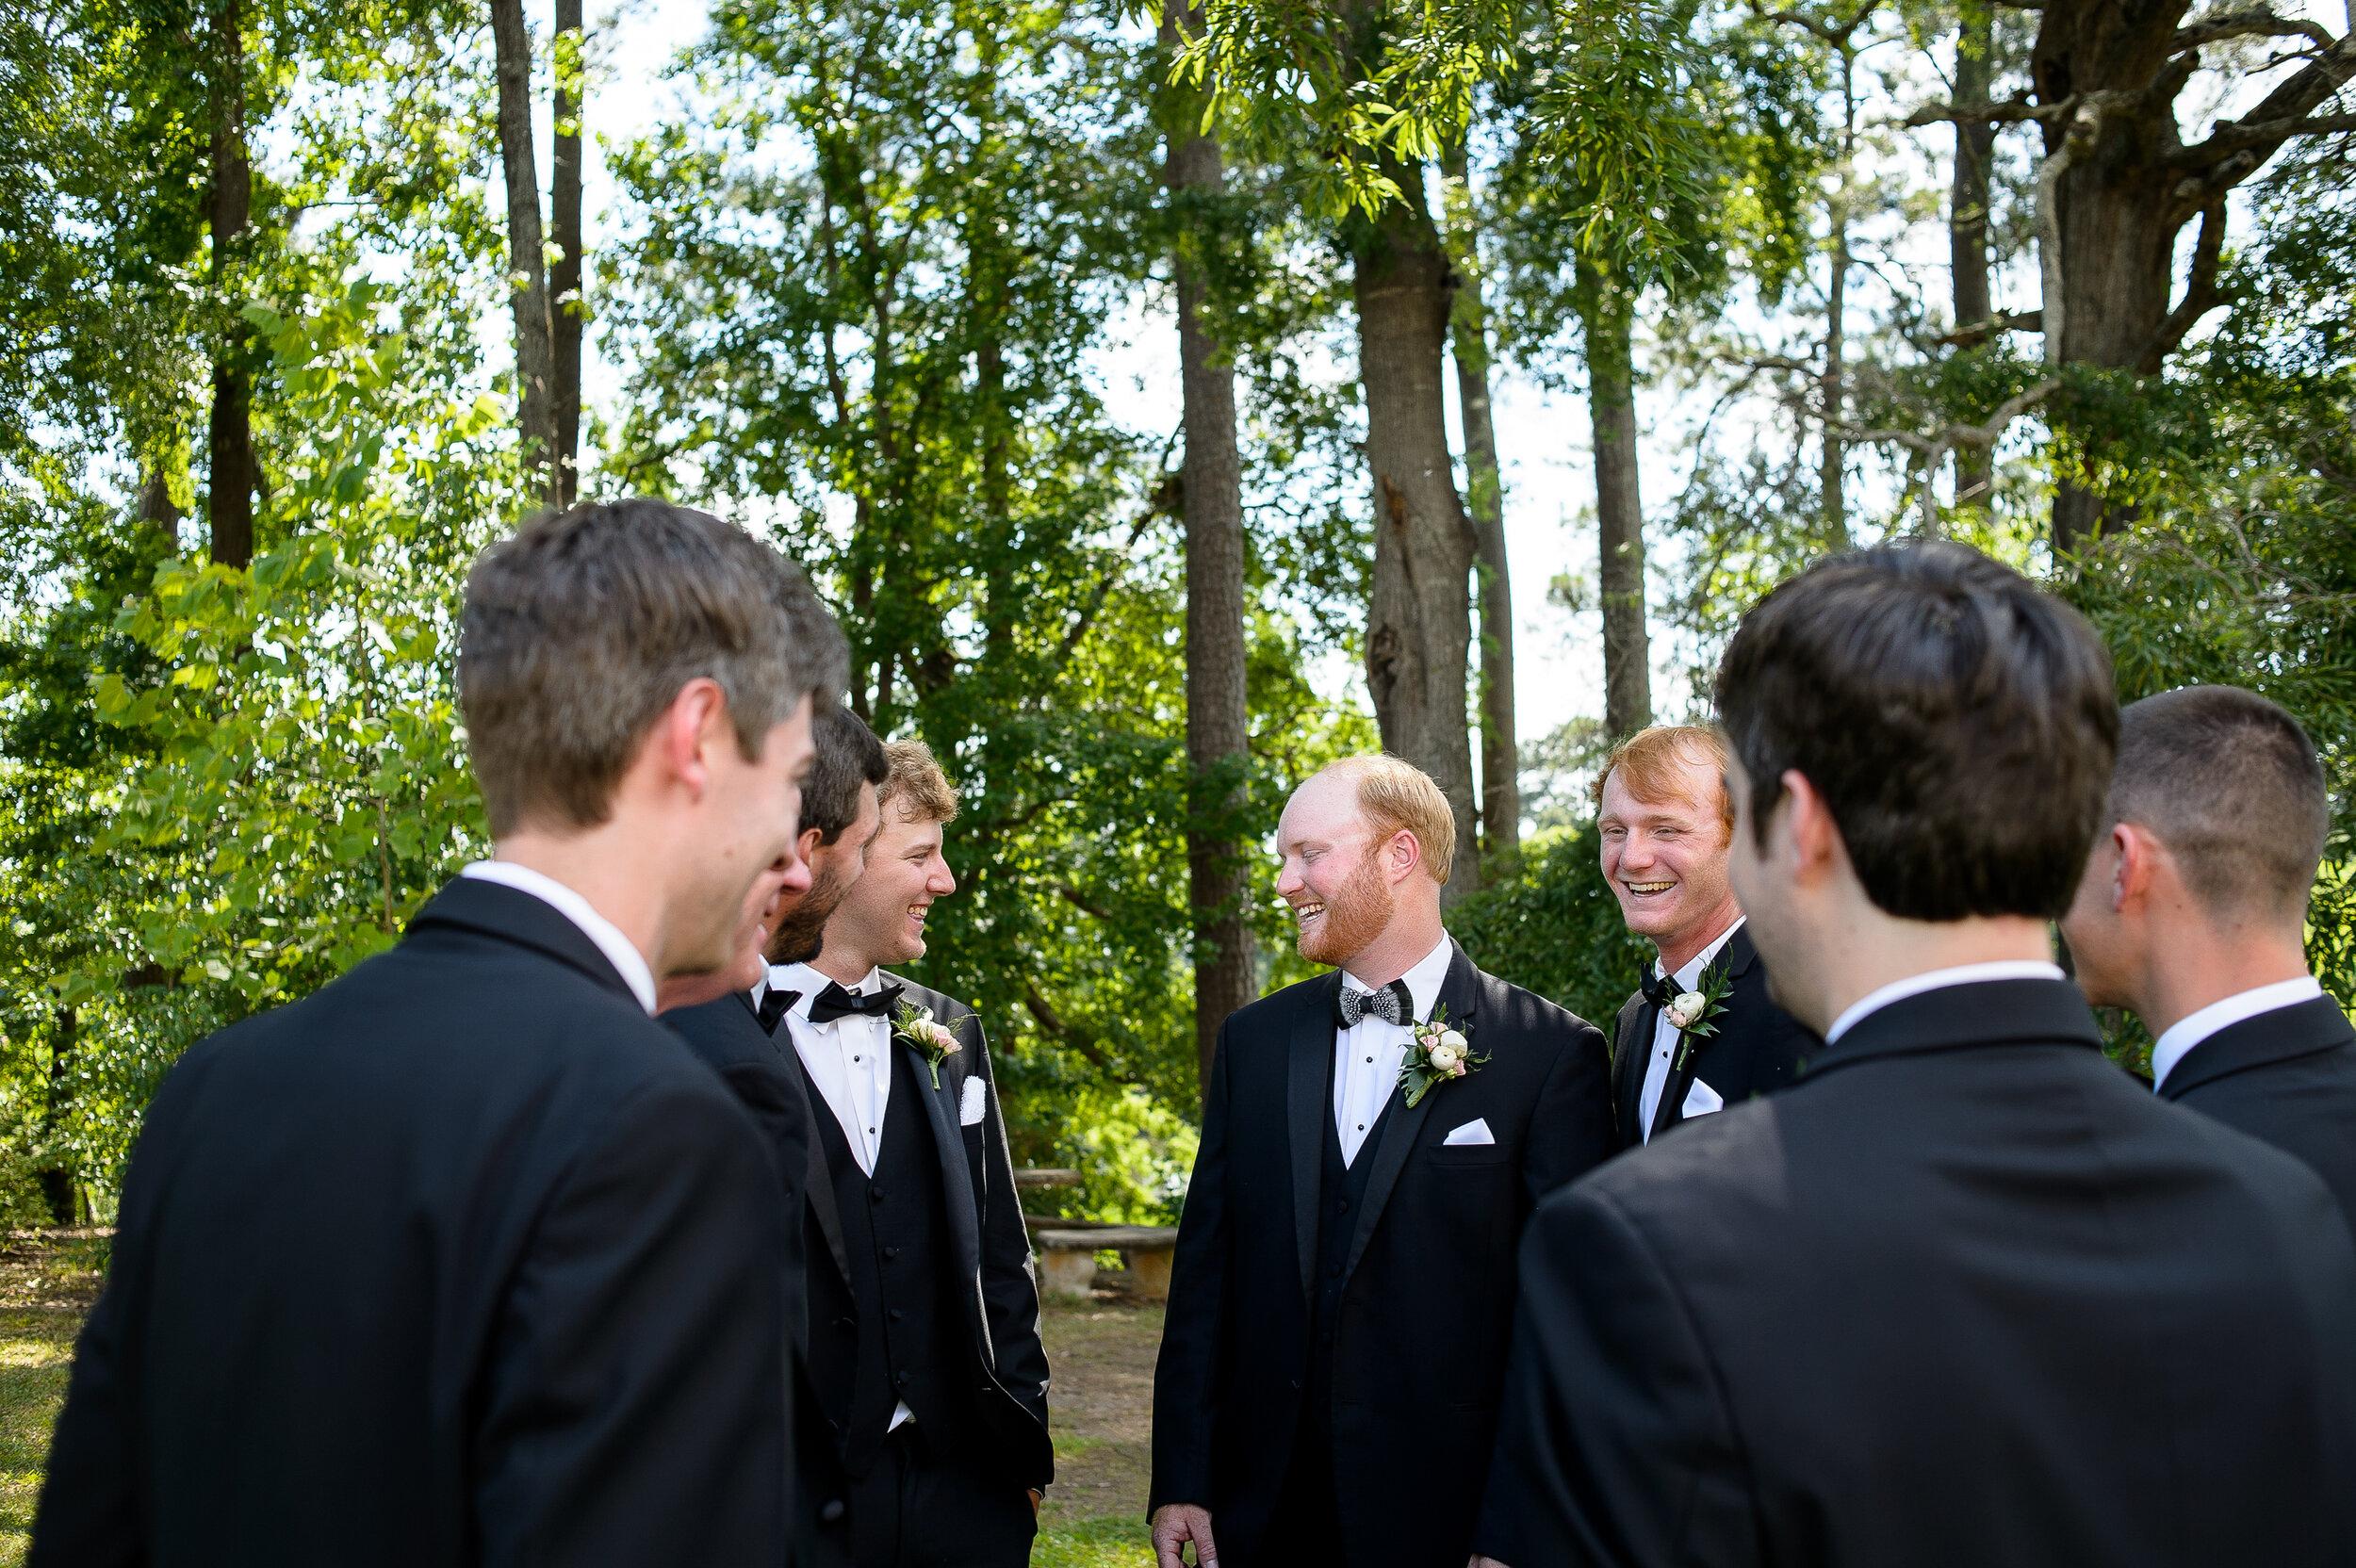 ClassicWesleyansummerwedding15.jpg